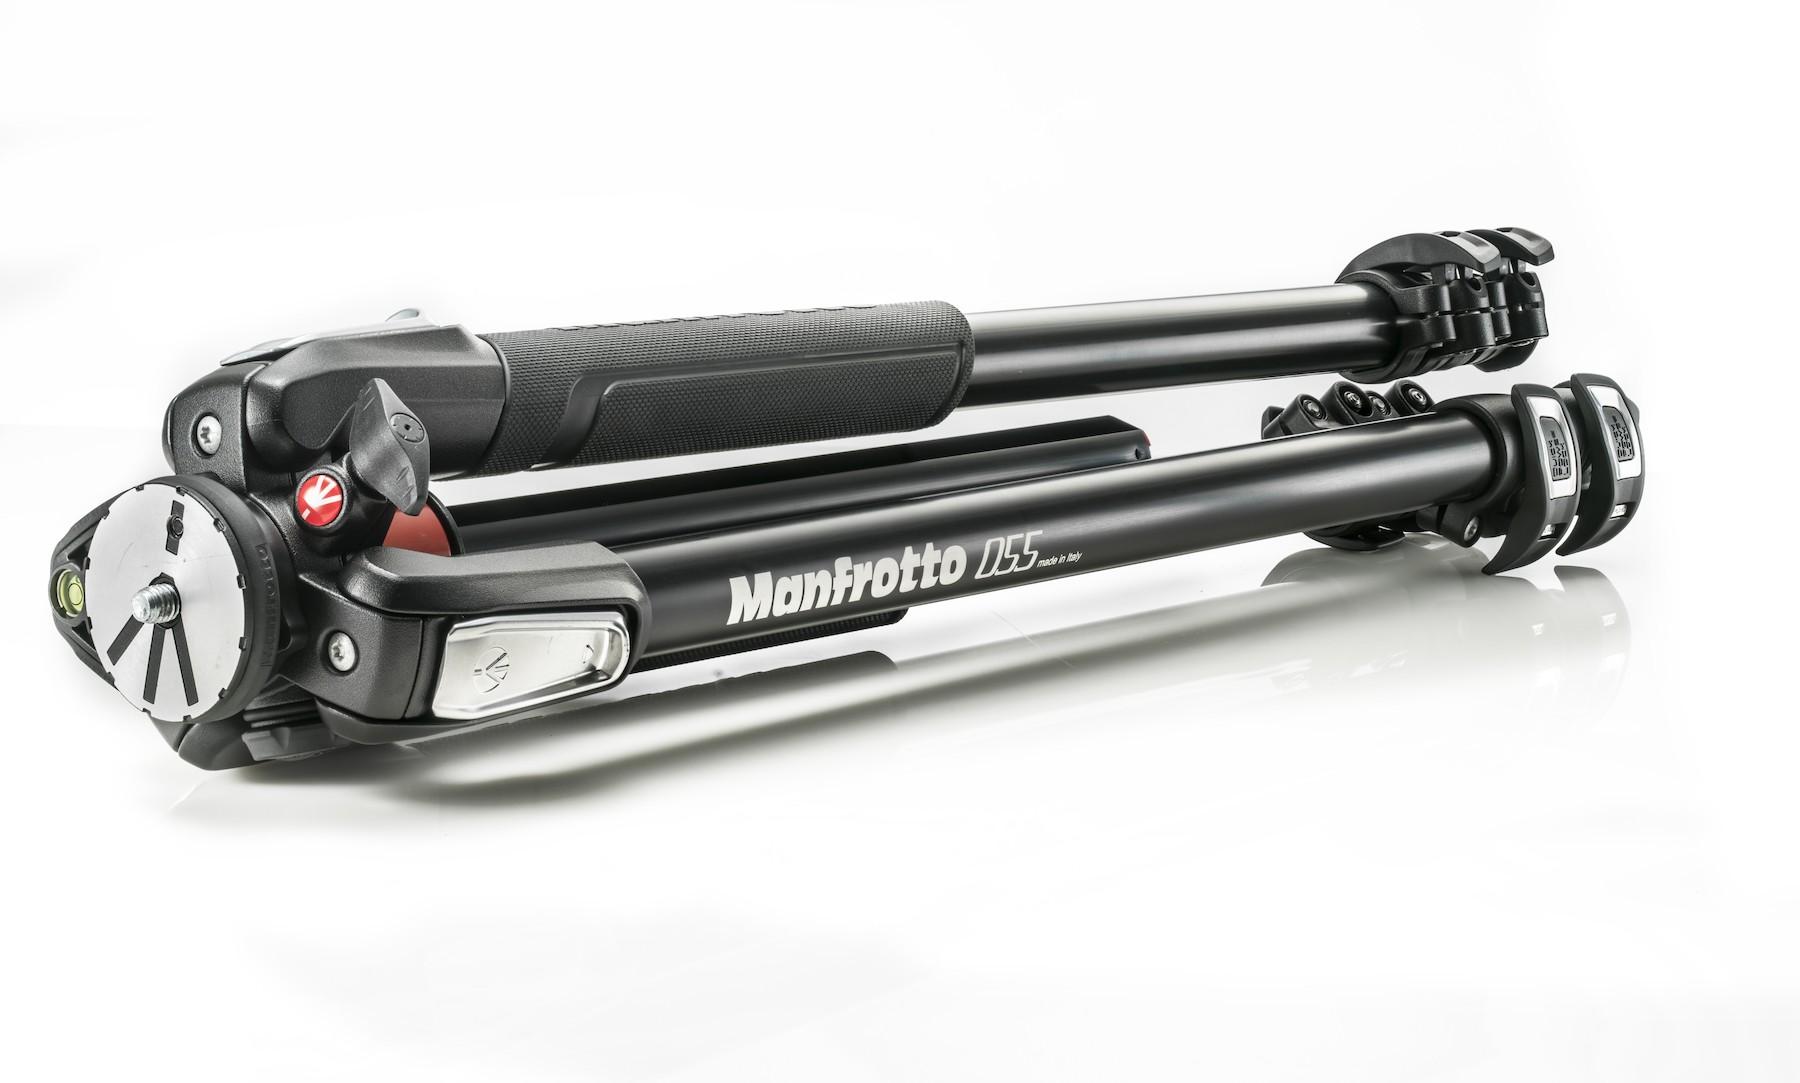 Manfrotto MT055XPRO3 Stativ (3 Segmente) + MHXPRO-BHQ2 Kugelkopf aus Magnesium